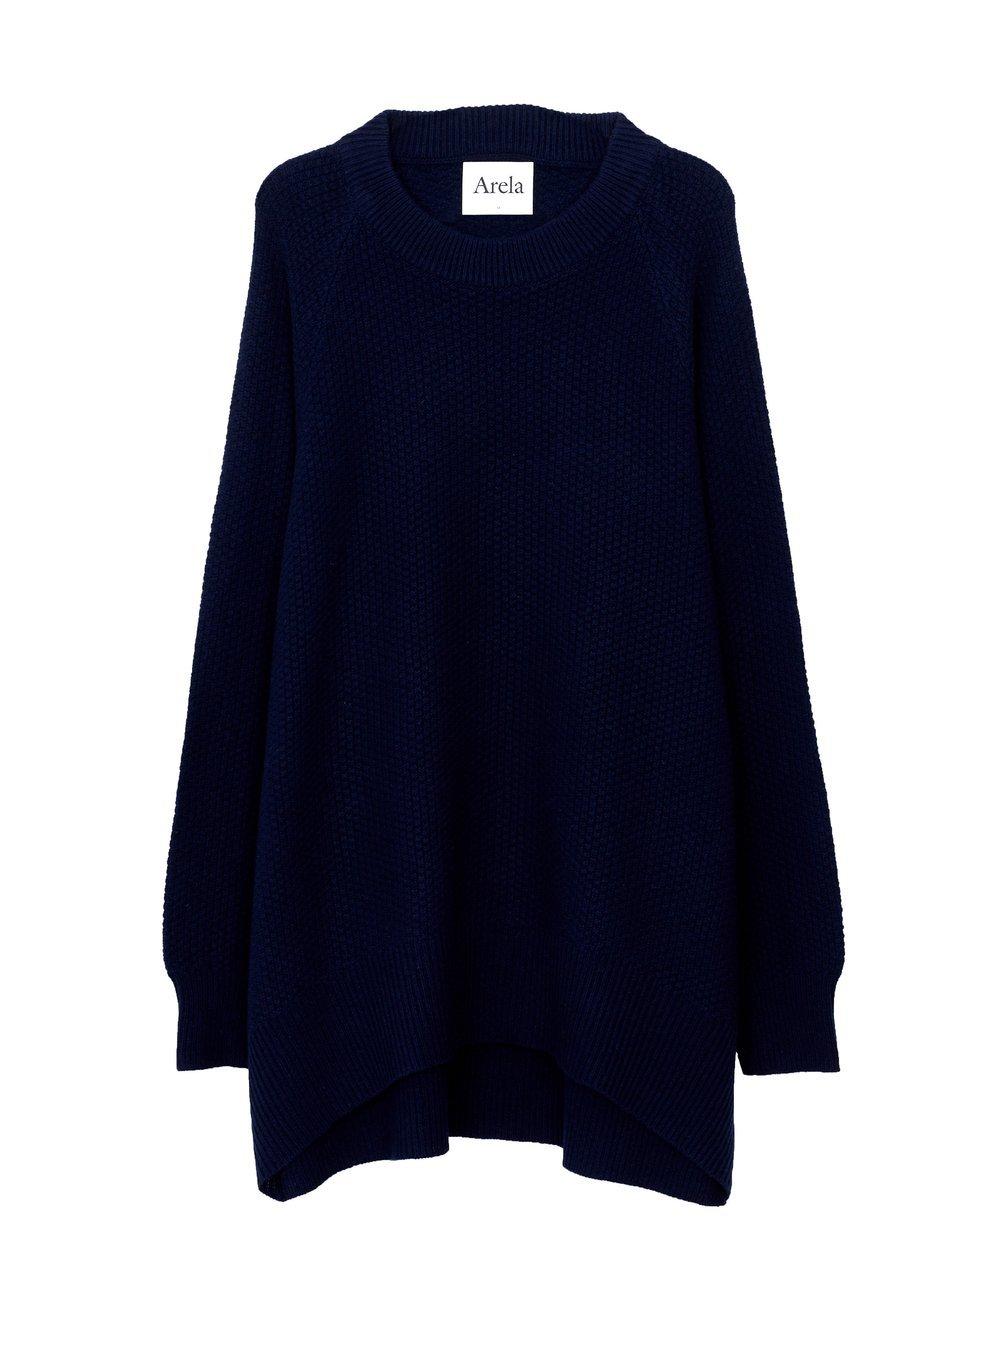 ARELA Disa Cashmere Sweater In Dark Blue